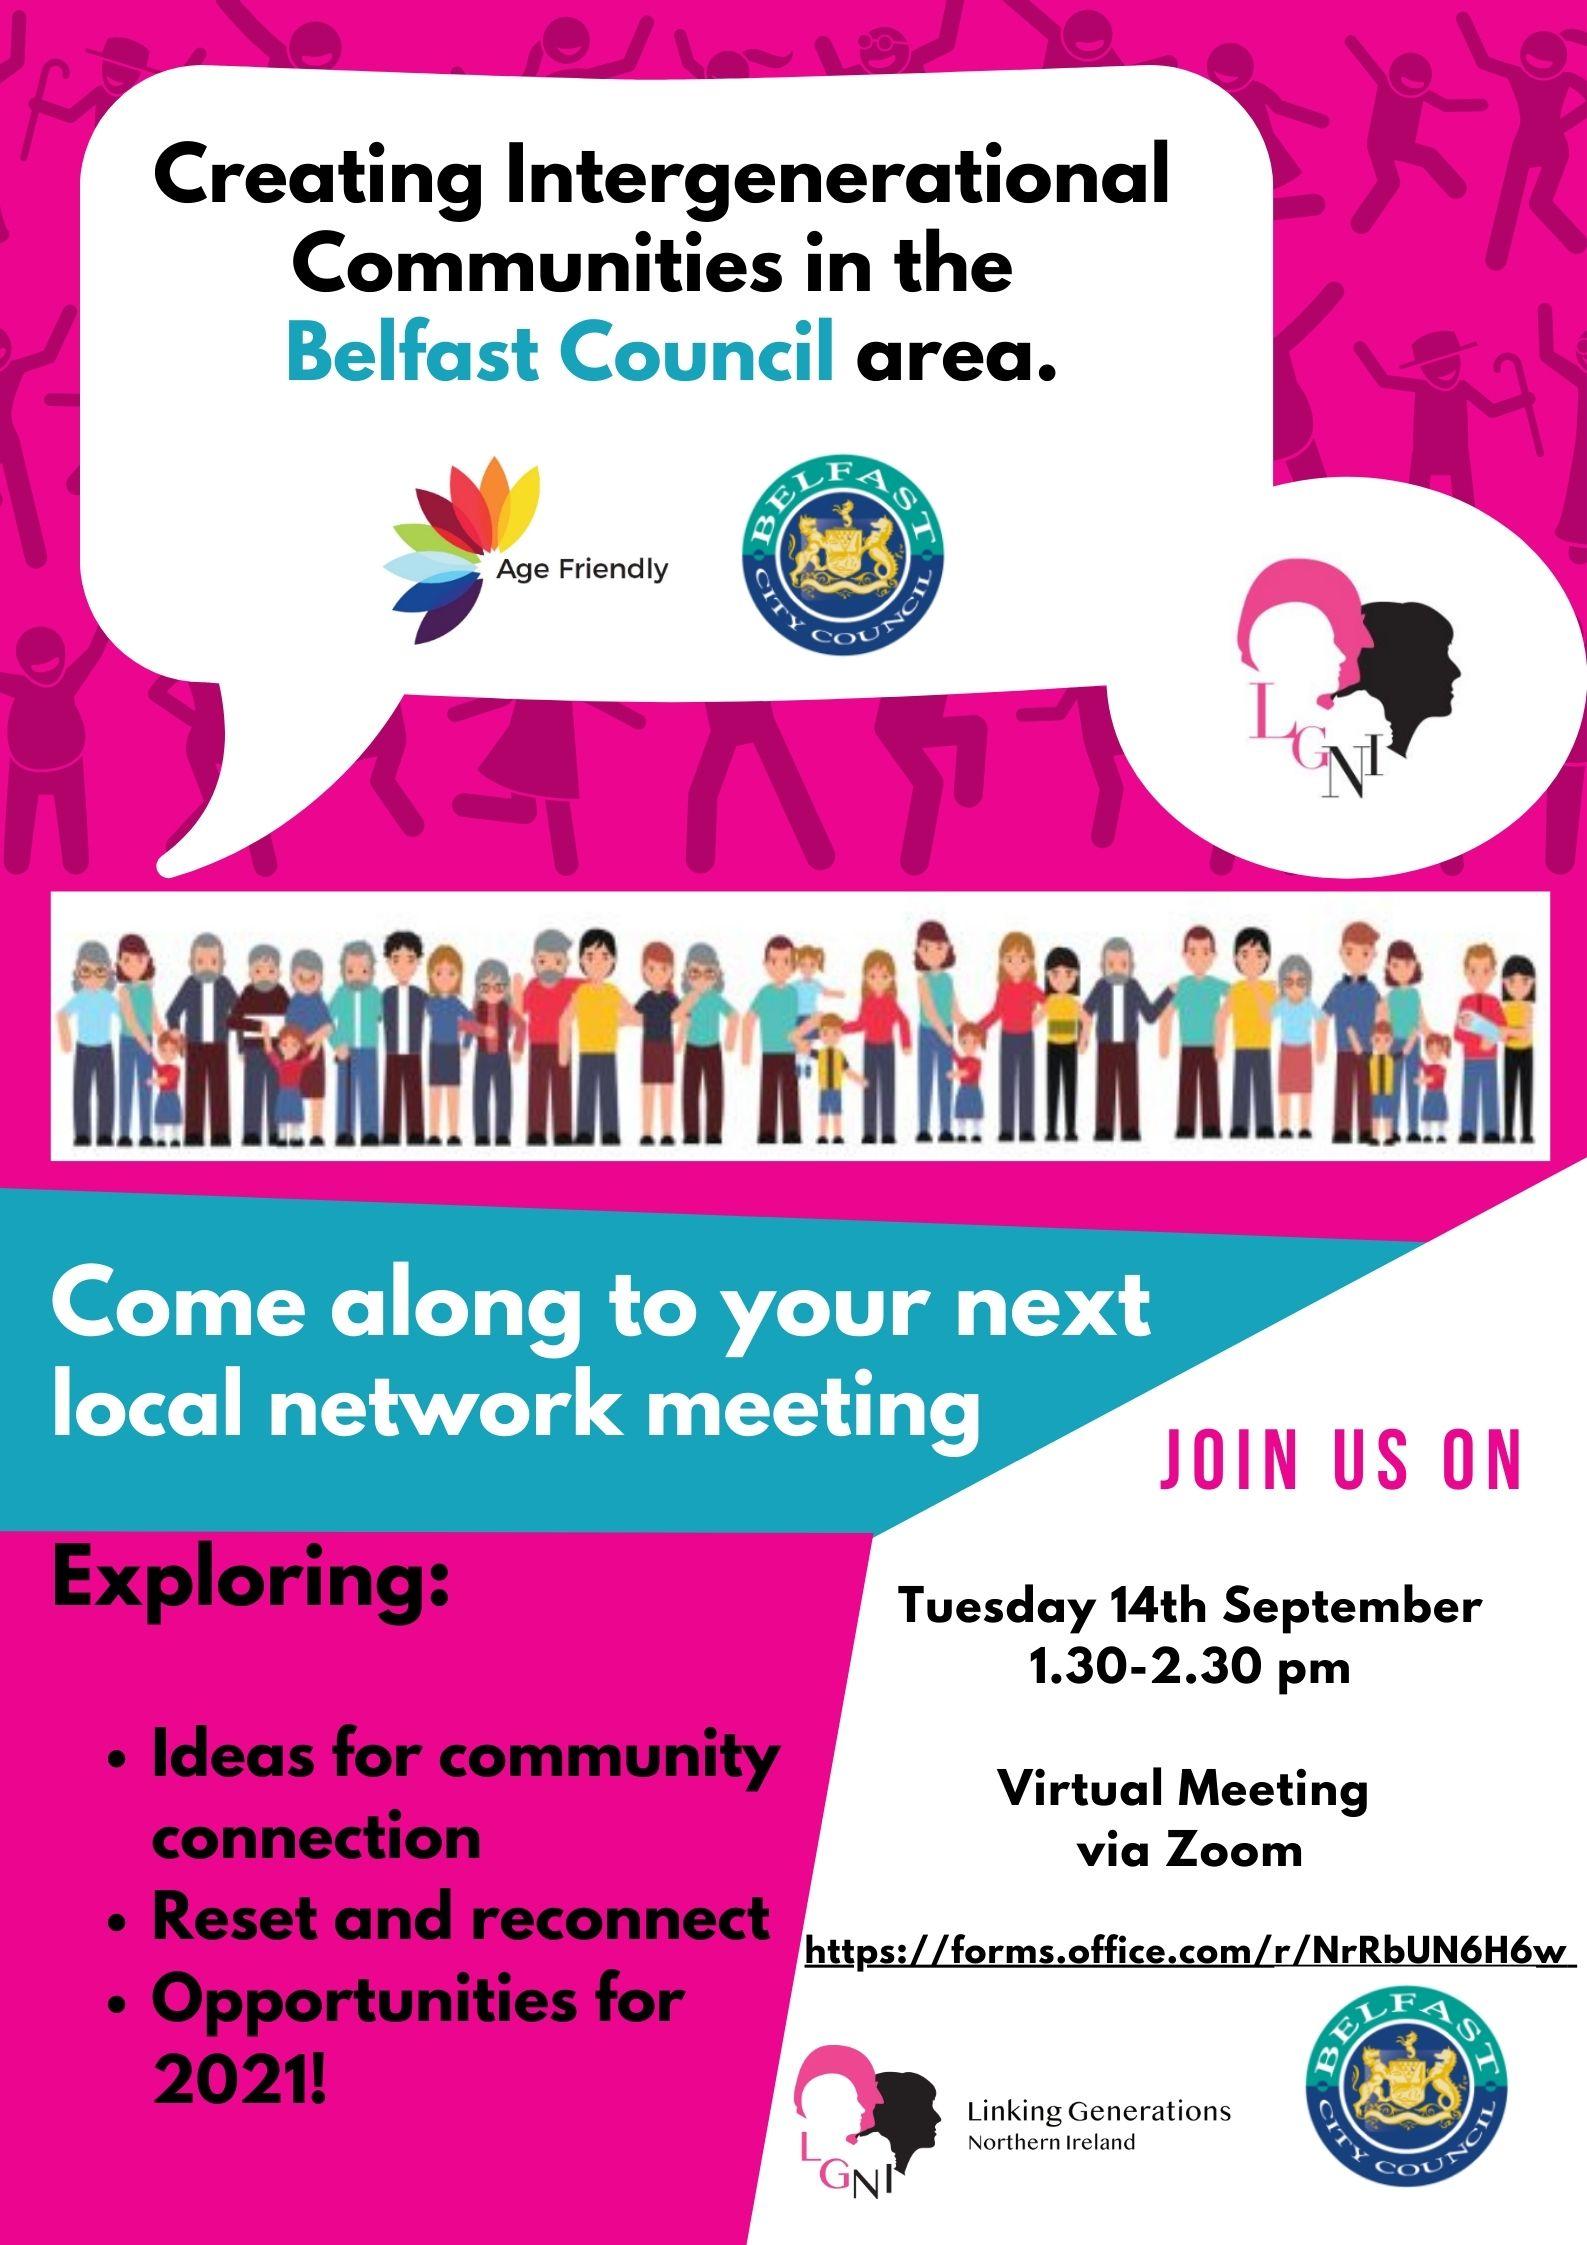 LGNI Belfast Network Meeting